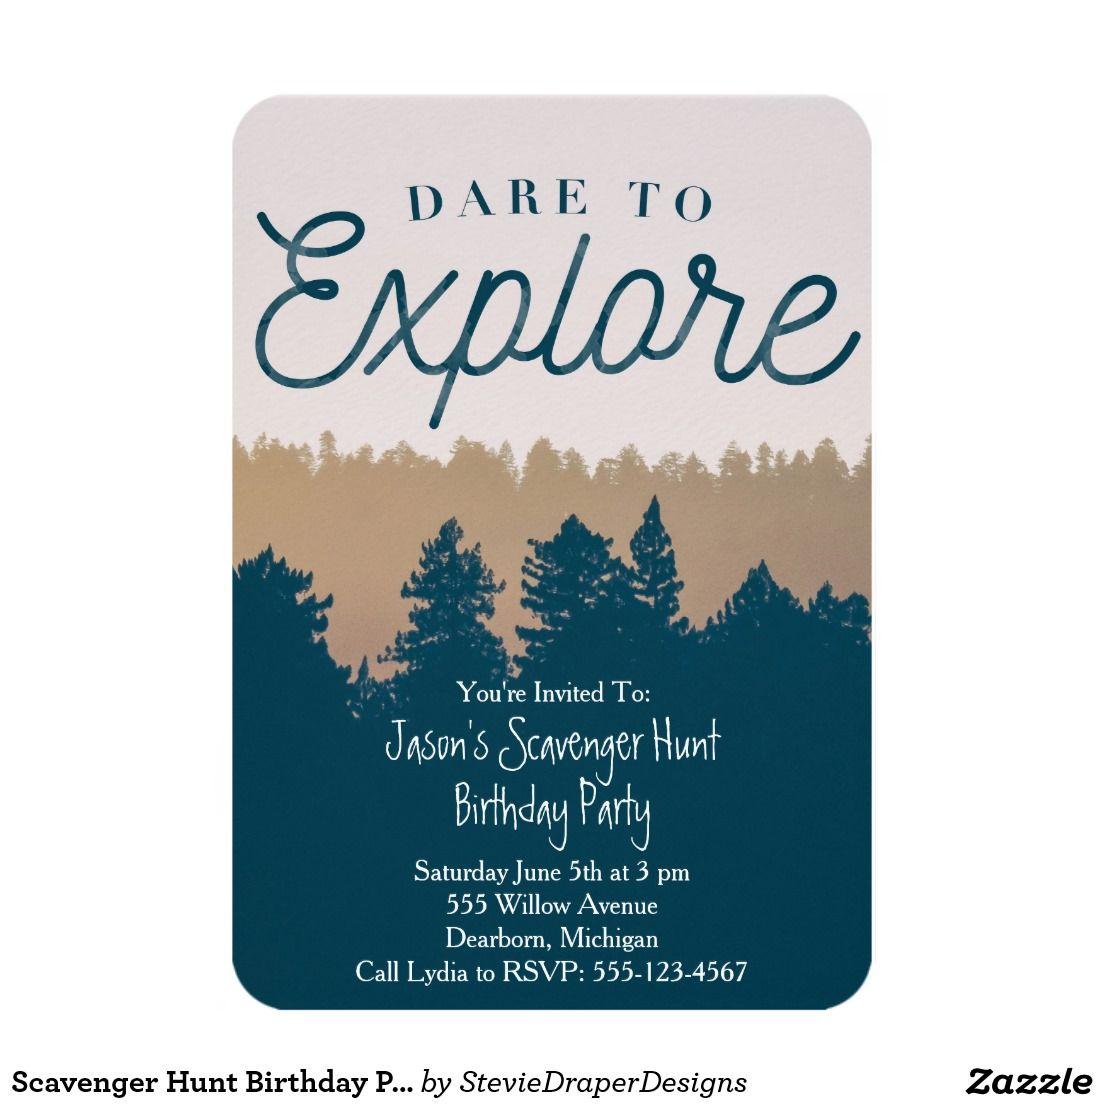 Scavenger Hunt Birthday Party Invitation for Boys Zazzle